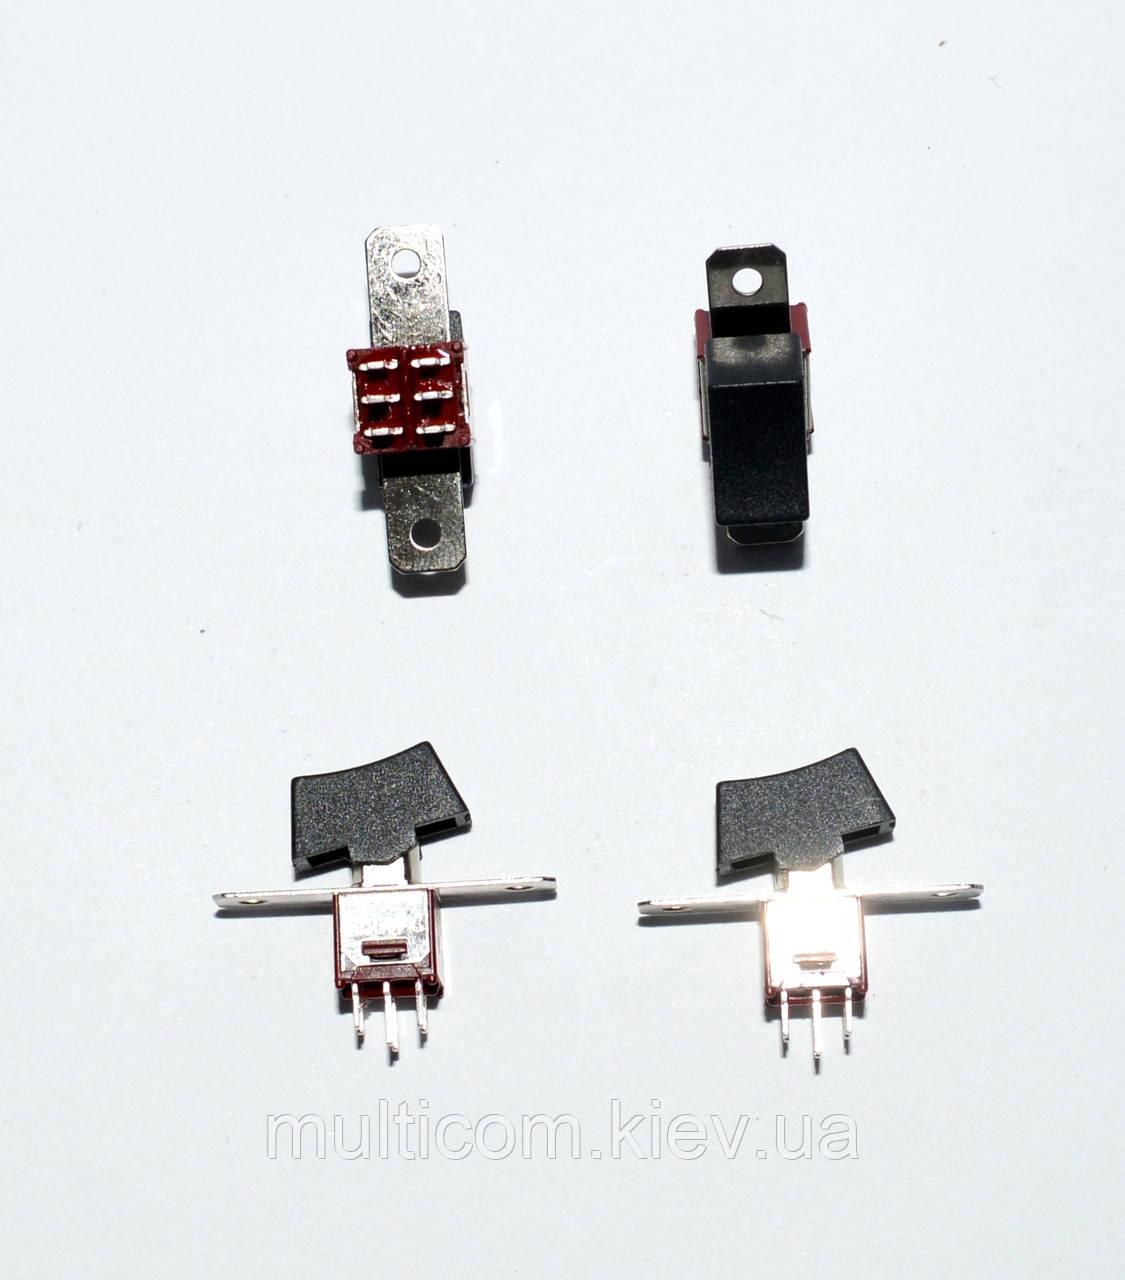 11-00-011. Тумблер с клавишей SRLS-202-A1 (ON-ON), 6pin, 1,5A 250VAC